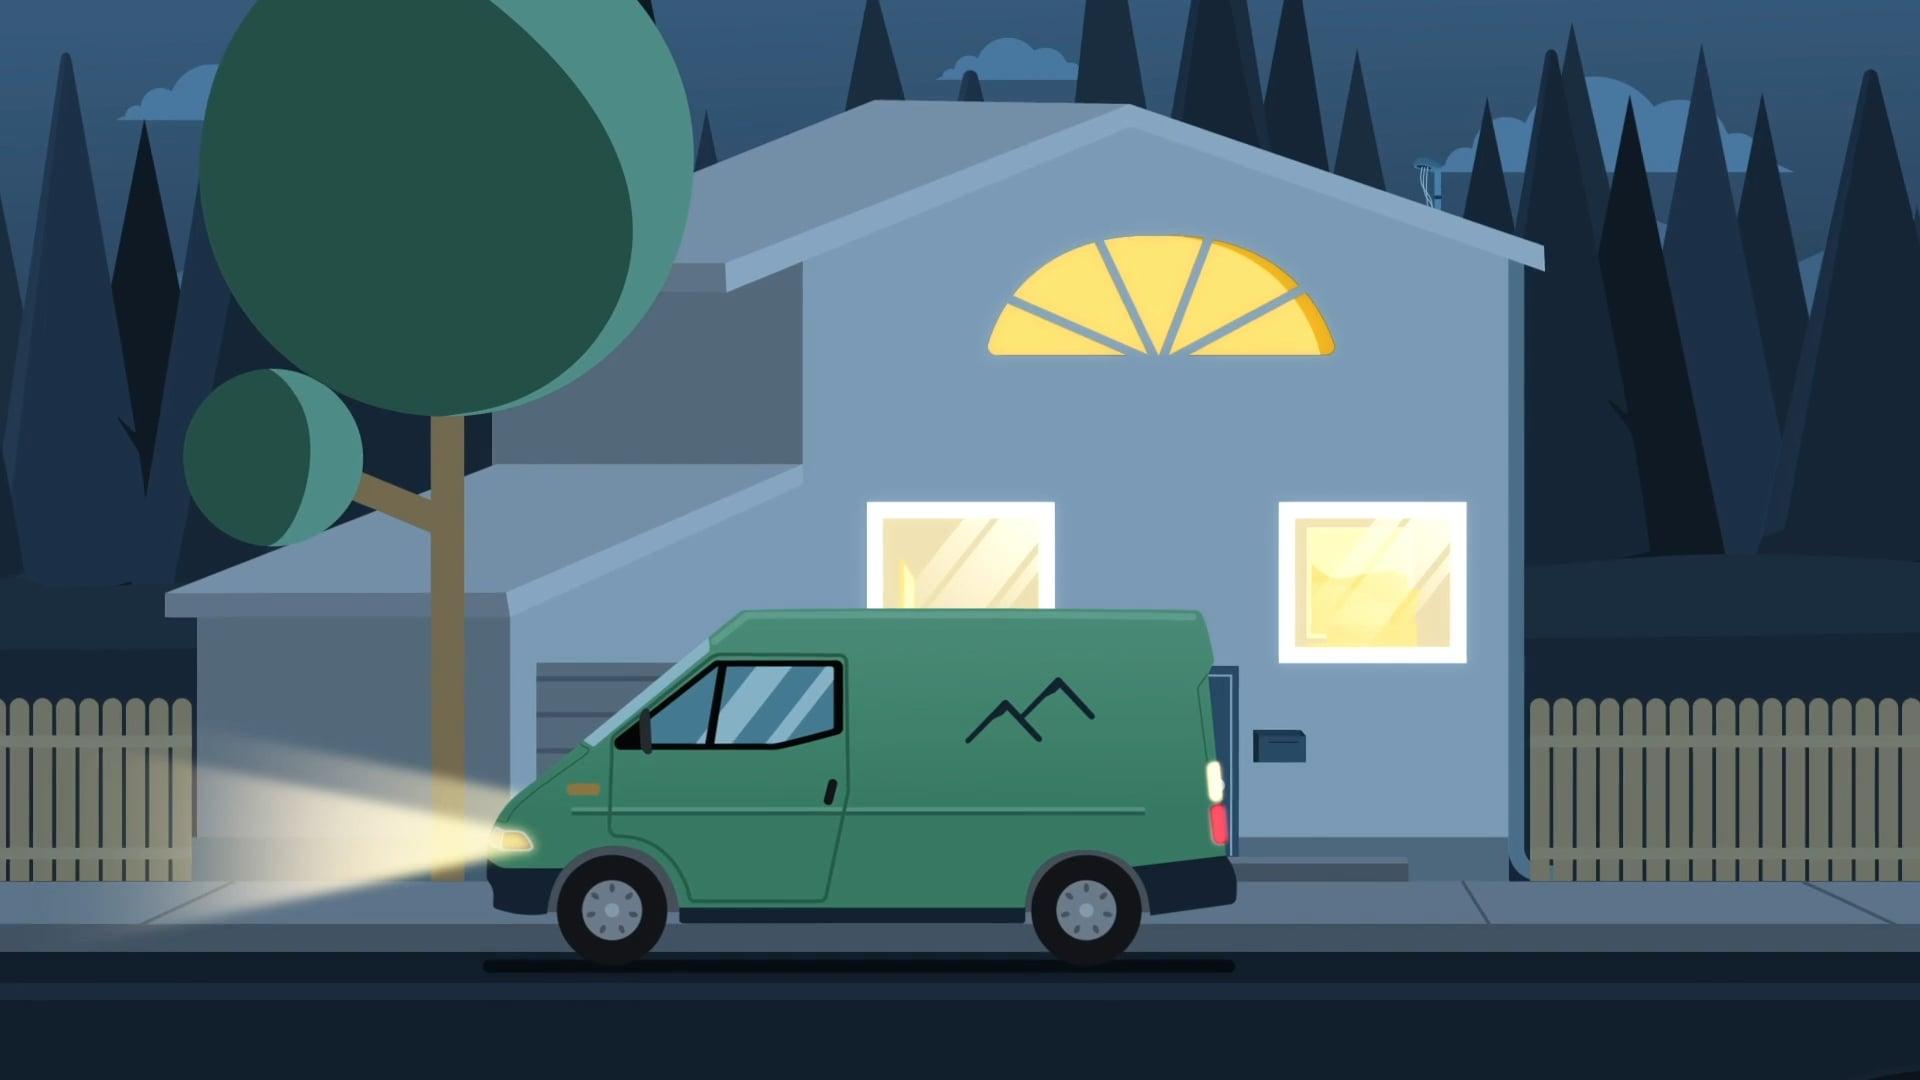 Colorado Springs Utilities - Service Lines - Electricity - Second Draft